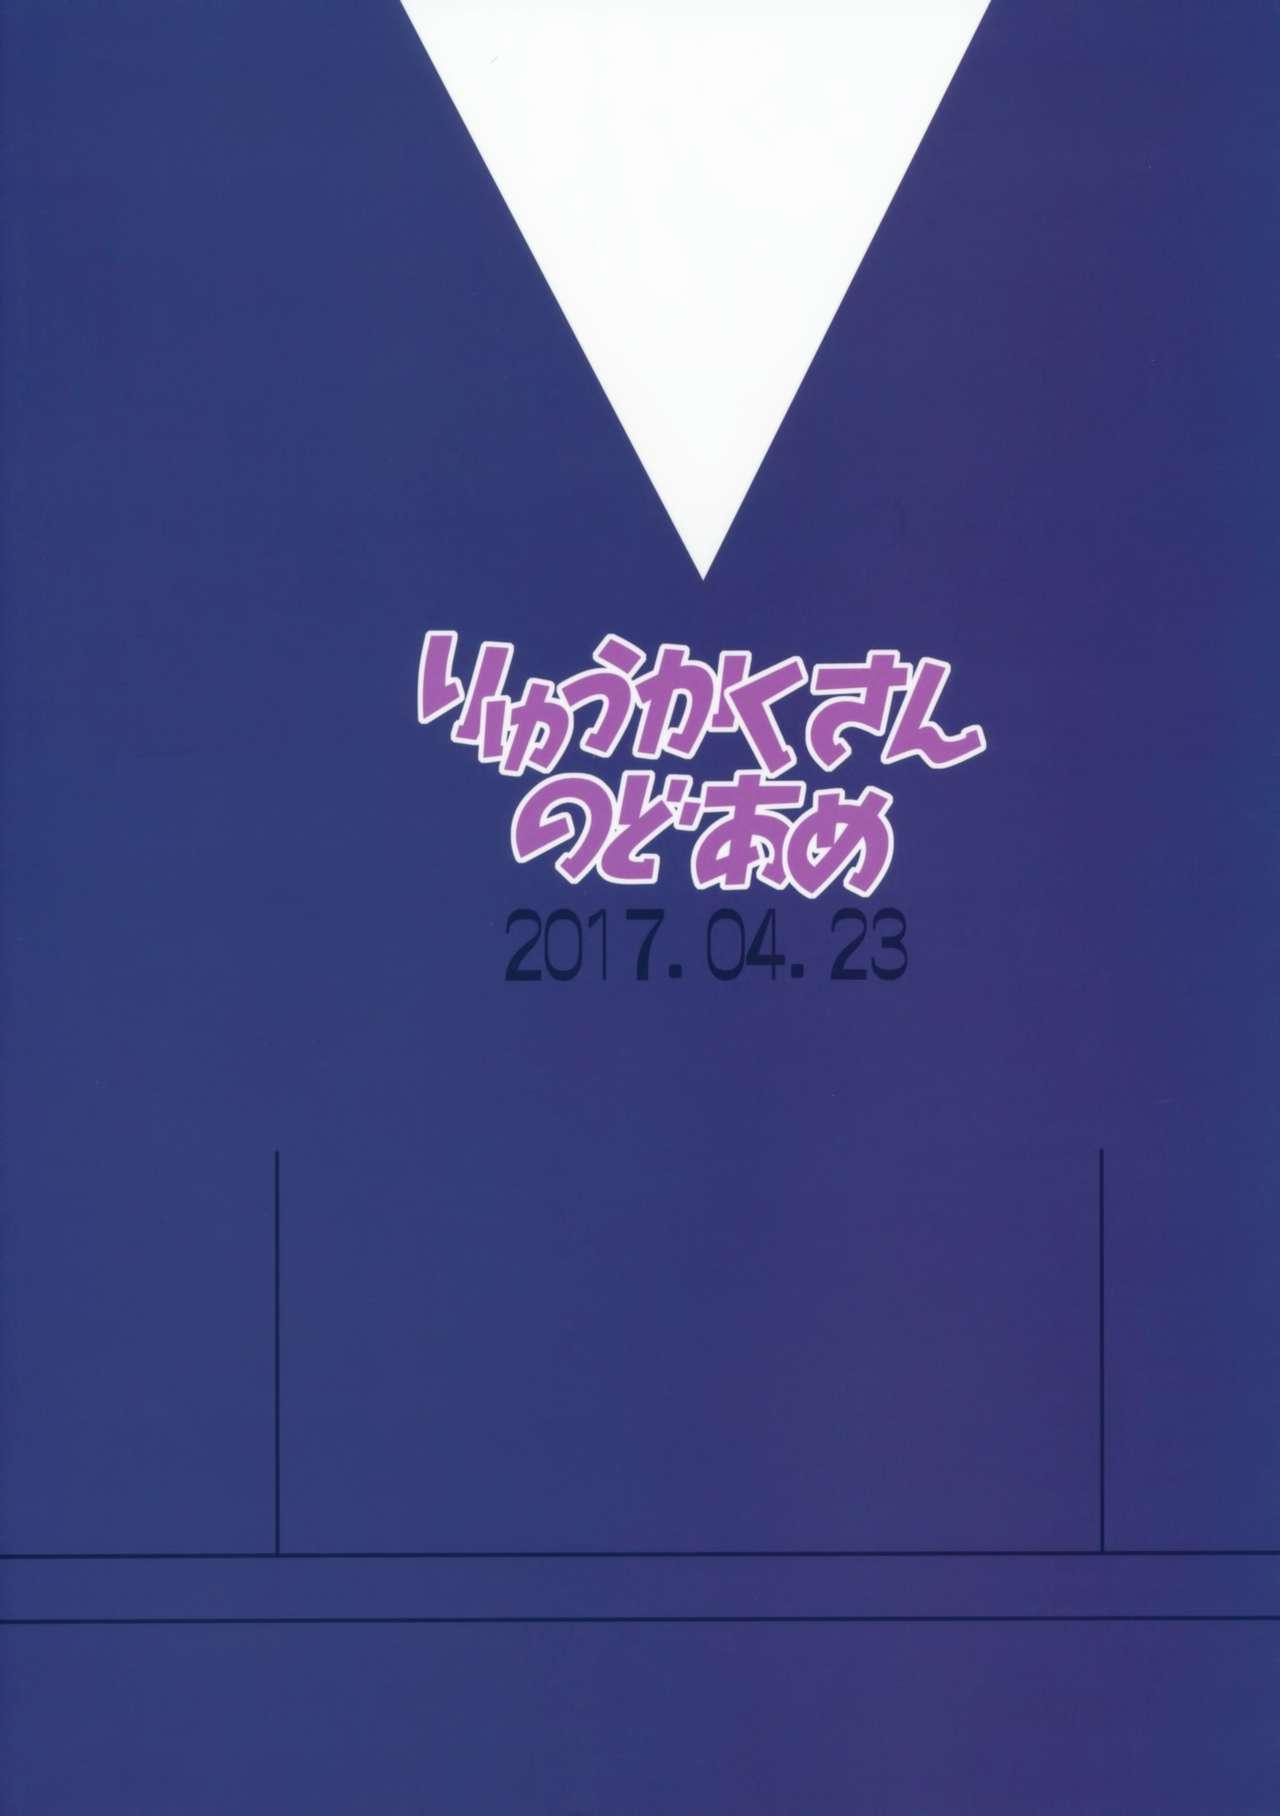 Idol ga Seifuku ni Kigaetara 21